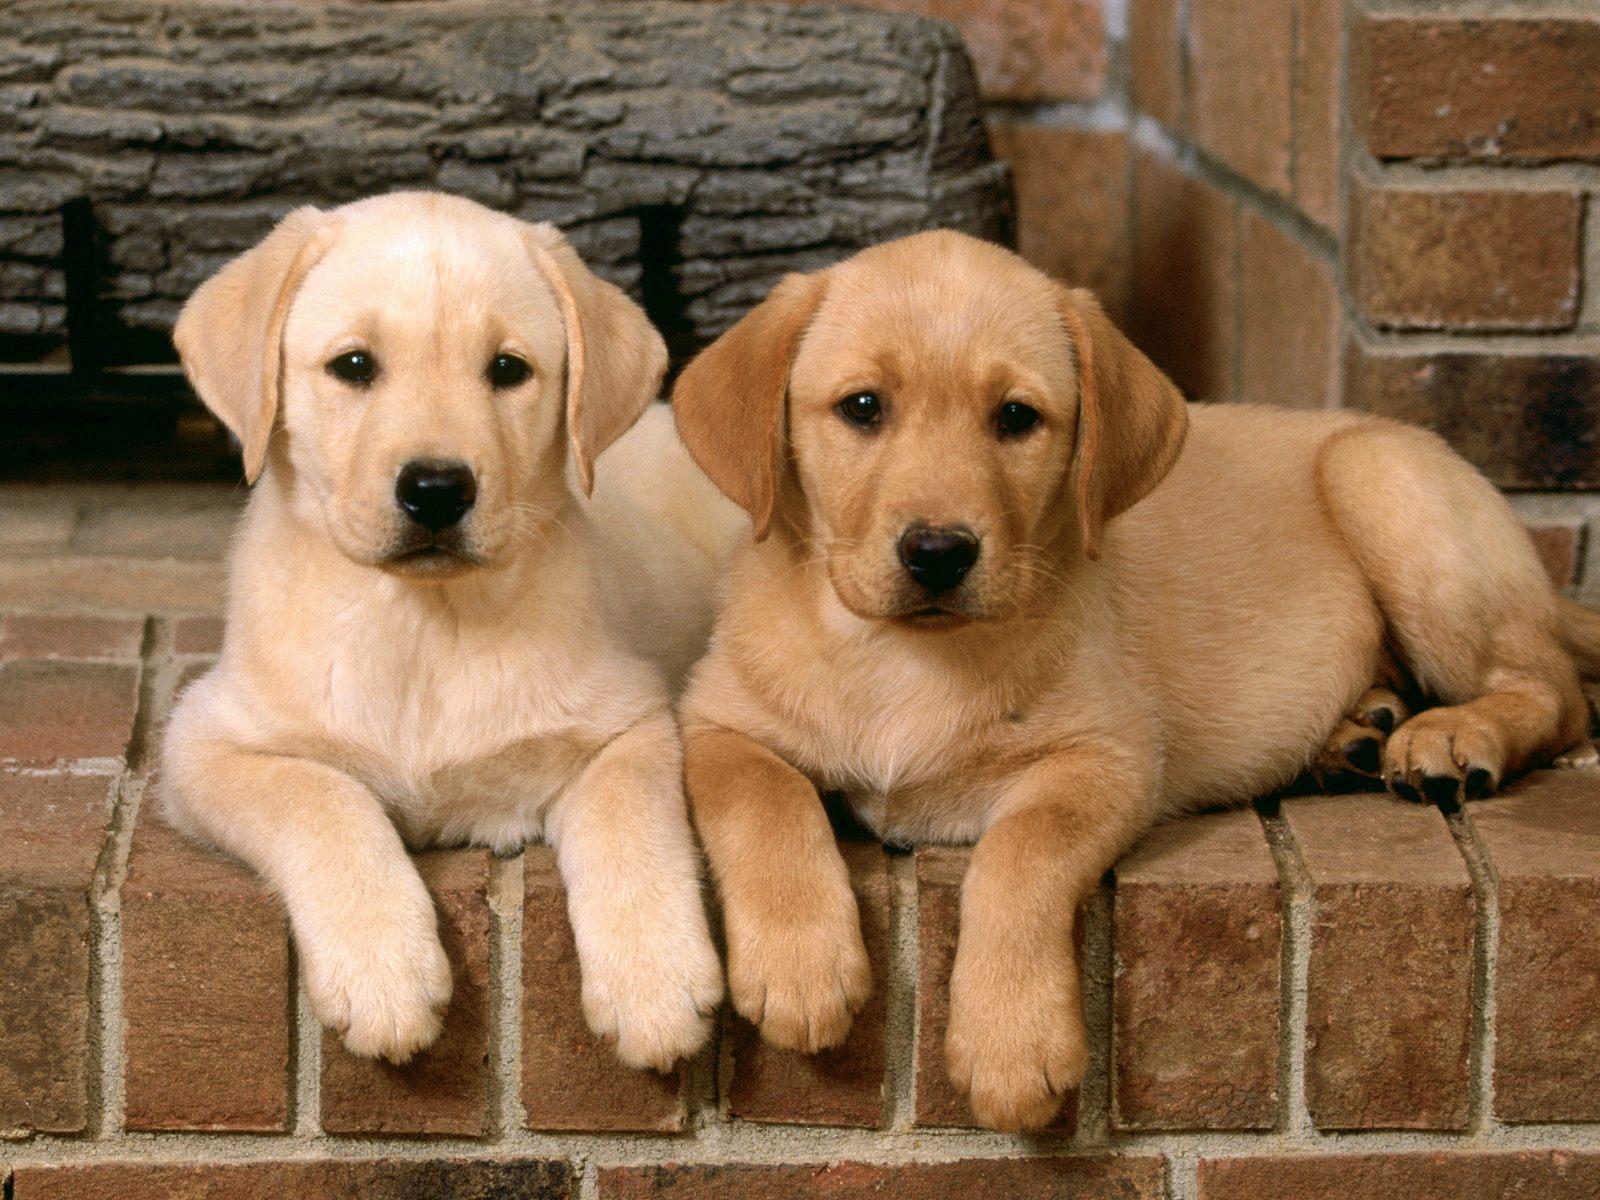 http://4.bp.blogspot.com/-y3E6aN5JVlU/UHE6aIzaxDI/AAAAAAAAG7c/fLn1dmmUK2o/s1600/Double-Trouble-Labrador-Retrievers.jpg